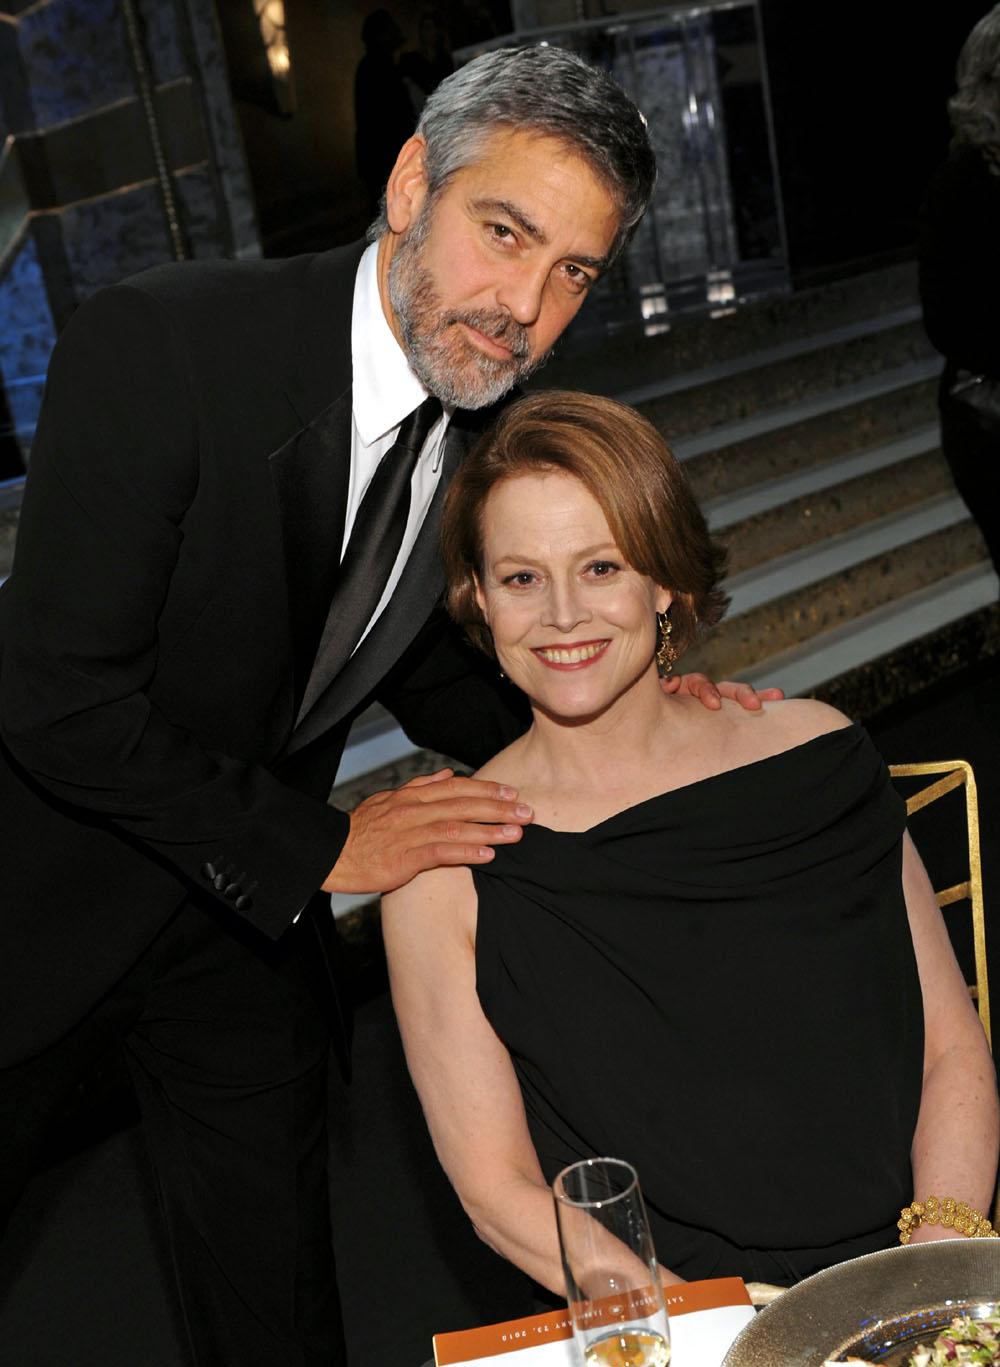 George Clooney, Sigourney Weaver